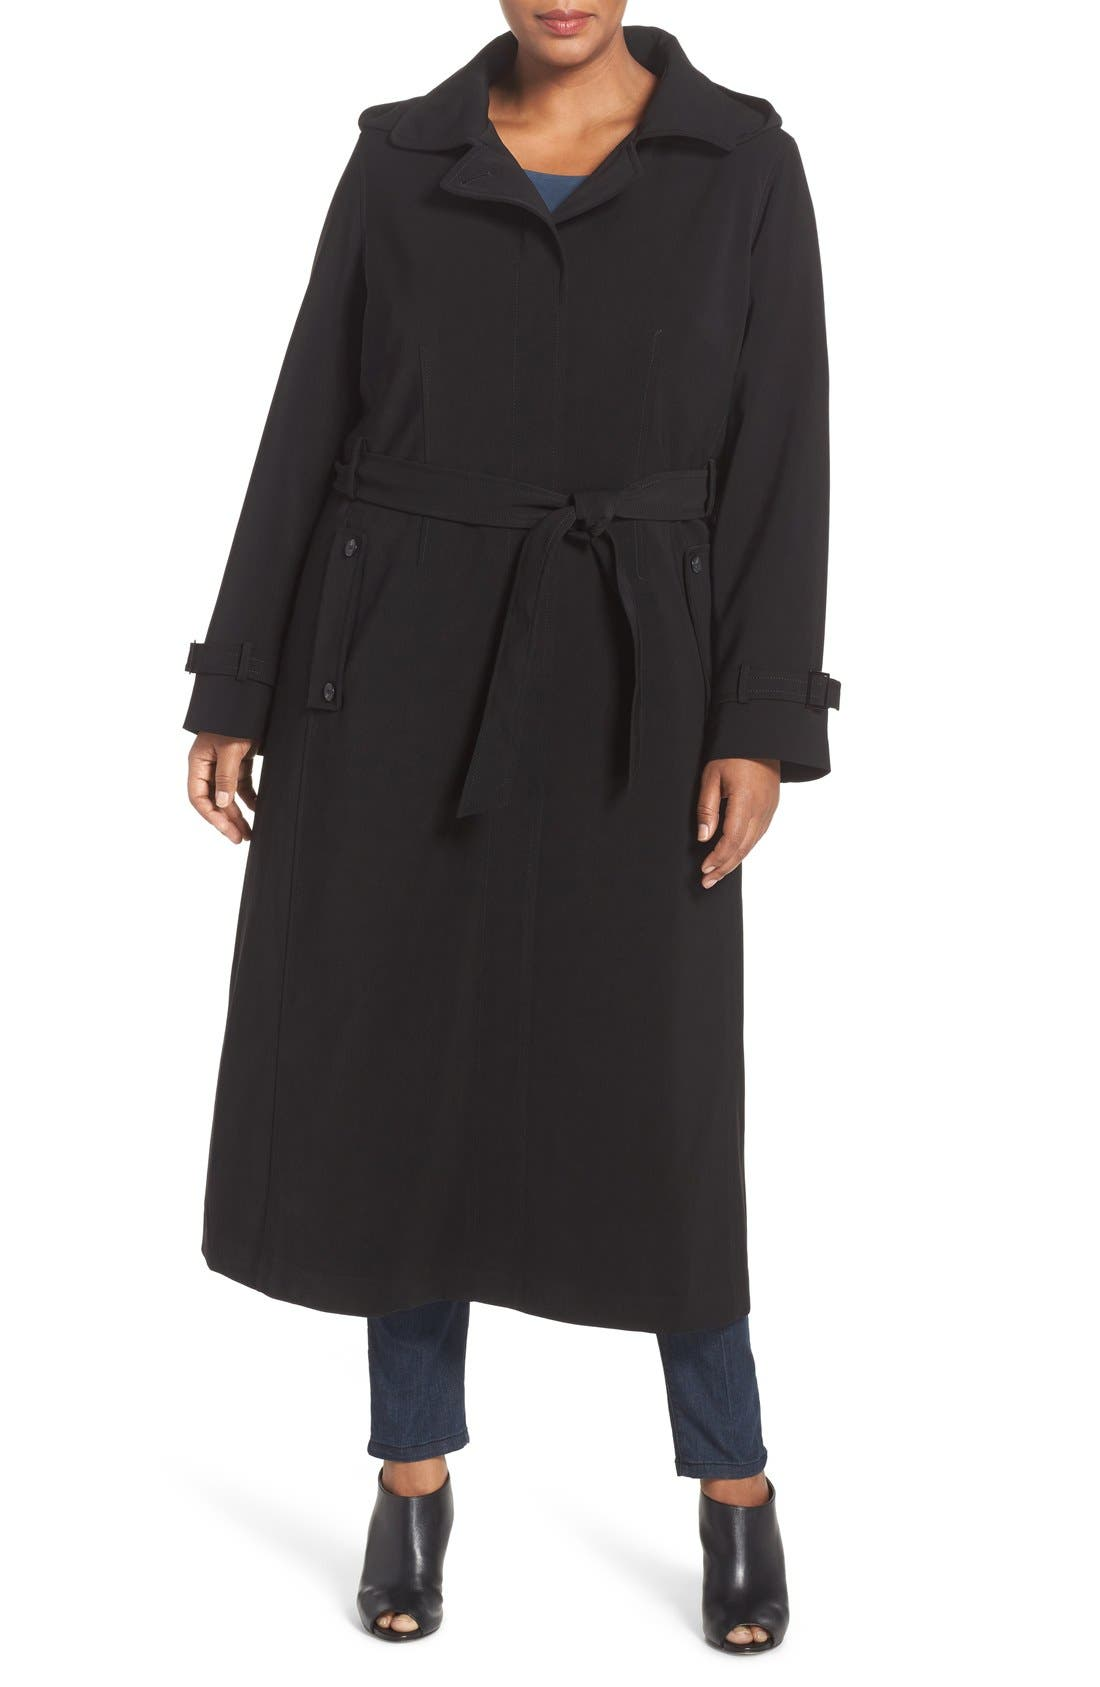 Long Nepage Raincoat with Detachable Hood & Liner,                             Main thumbnail 1, color,                             Black